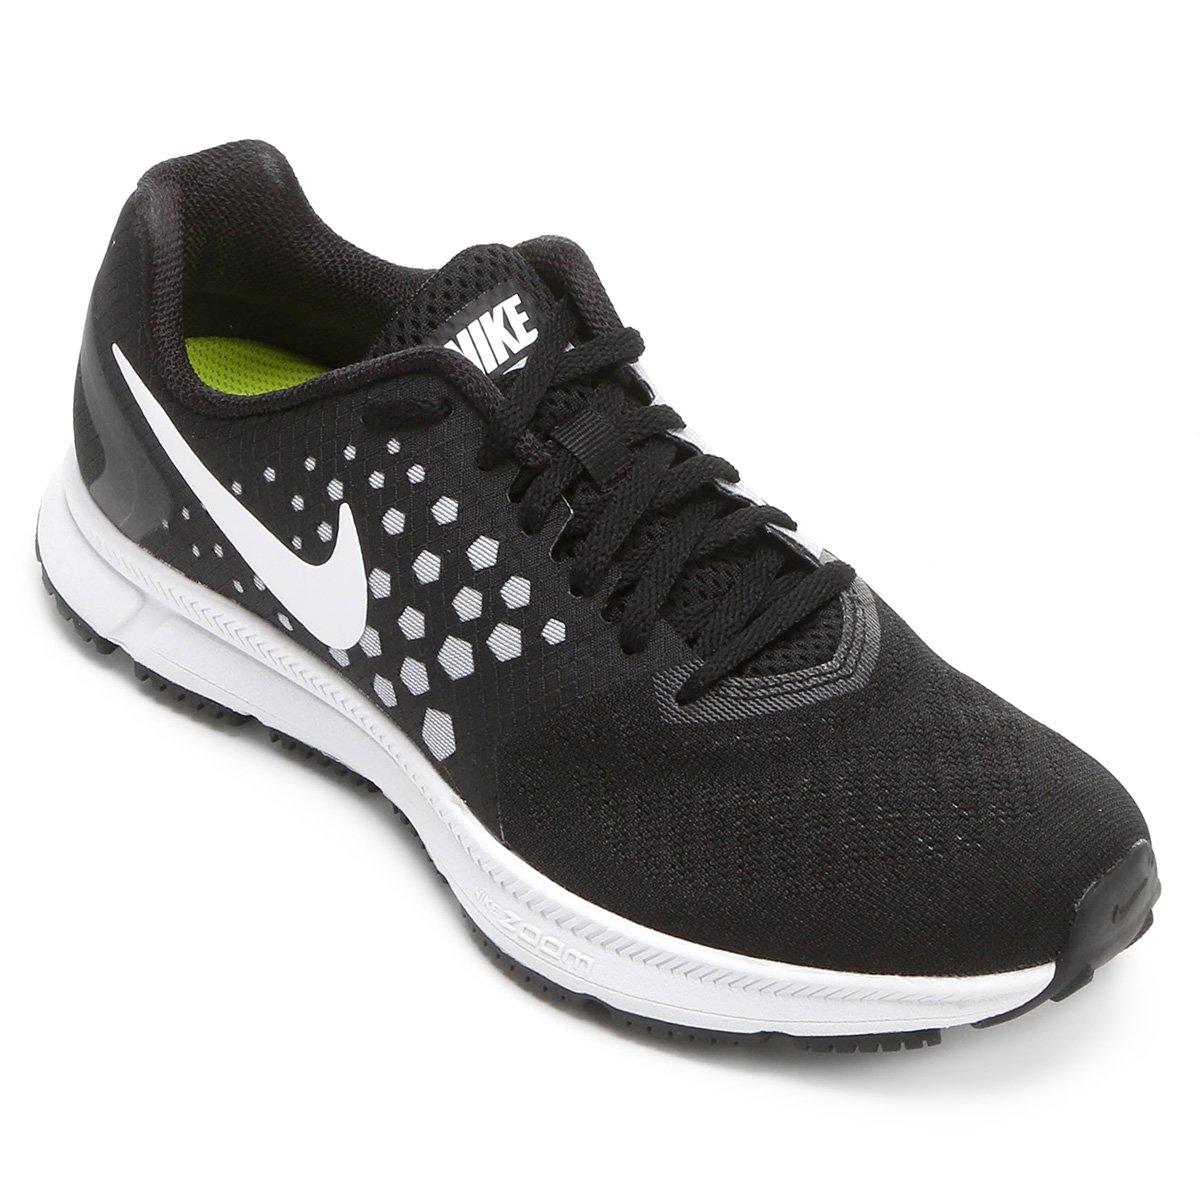 53039aed573 Tênis Nike Air Zoom Span Feminino - Compre Agora